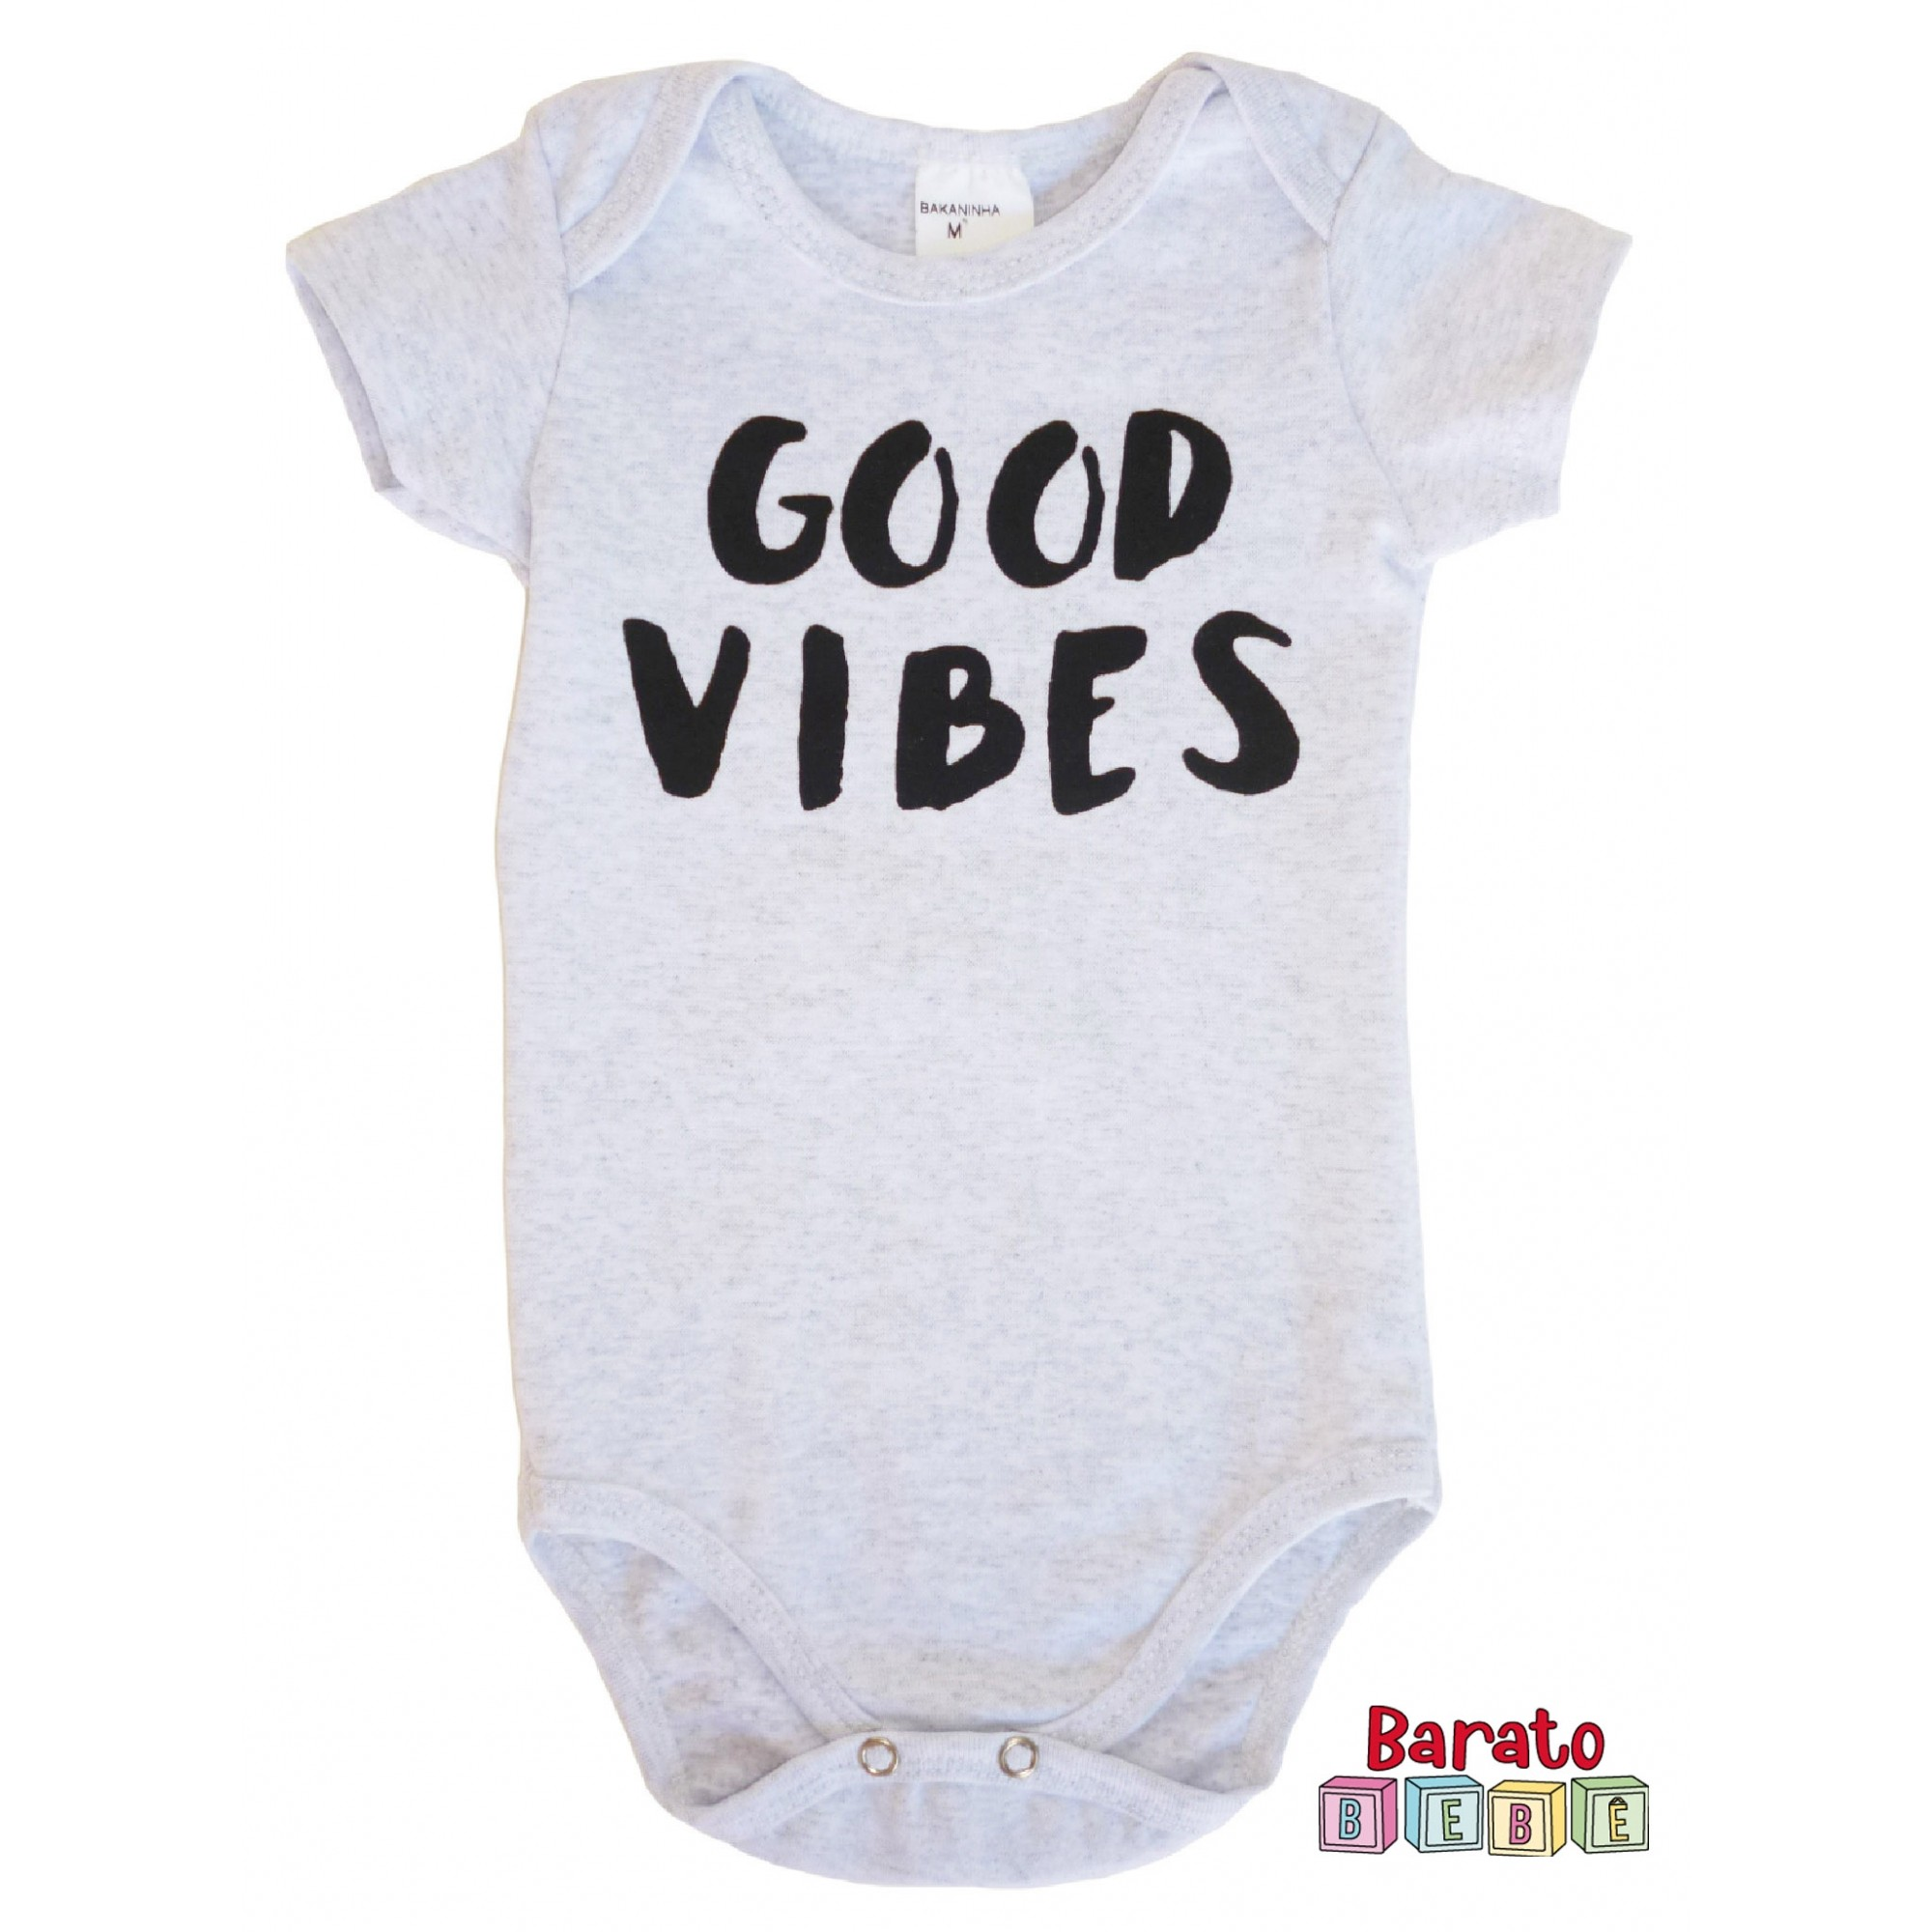 Body Bebê com Estampa Good Vibes - Mescla Branco